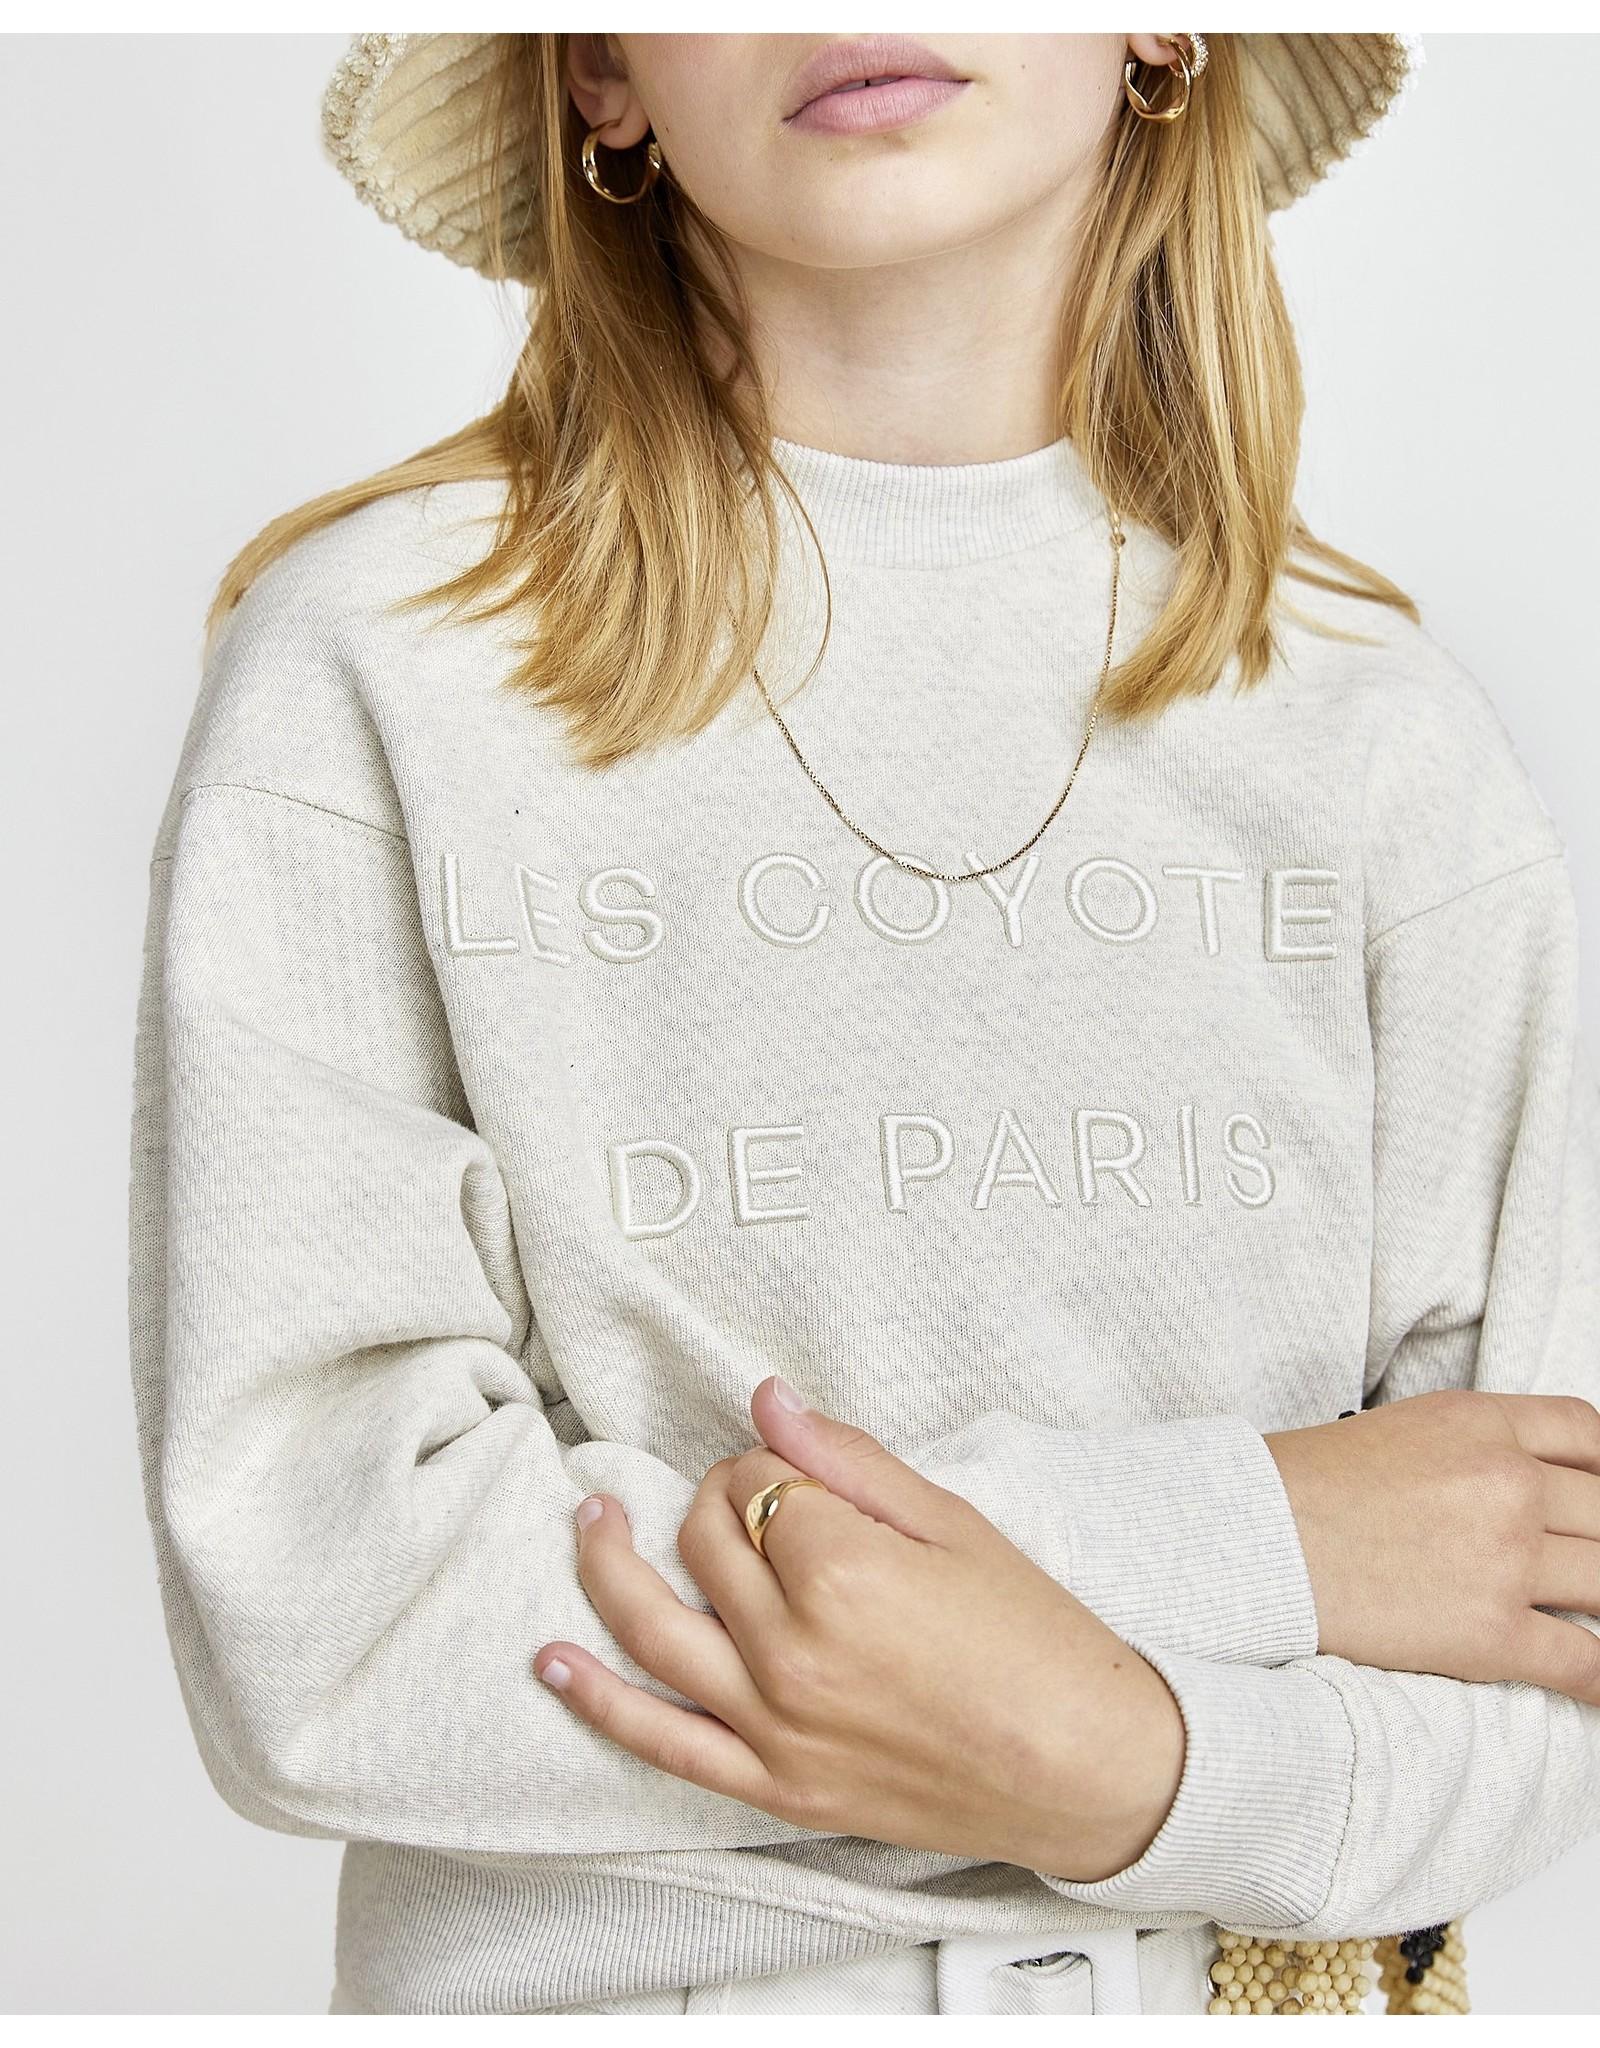 Les Coyotes de Paris LCDP SS21 Tate sweater